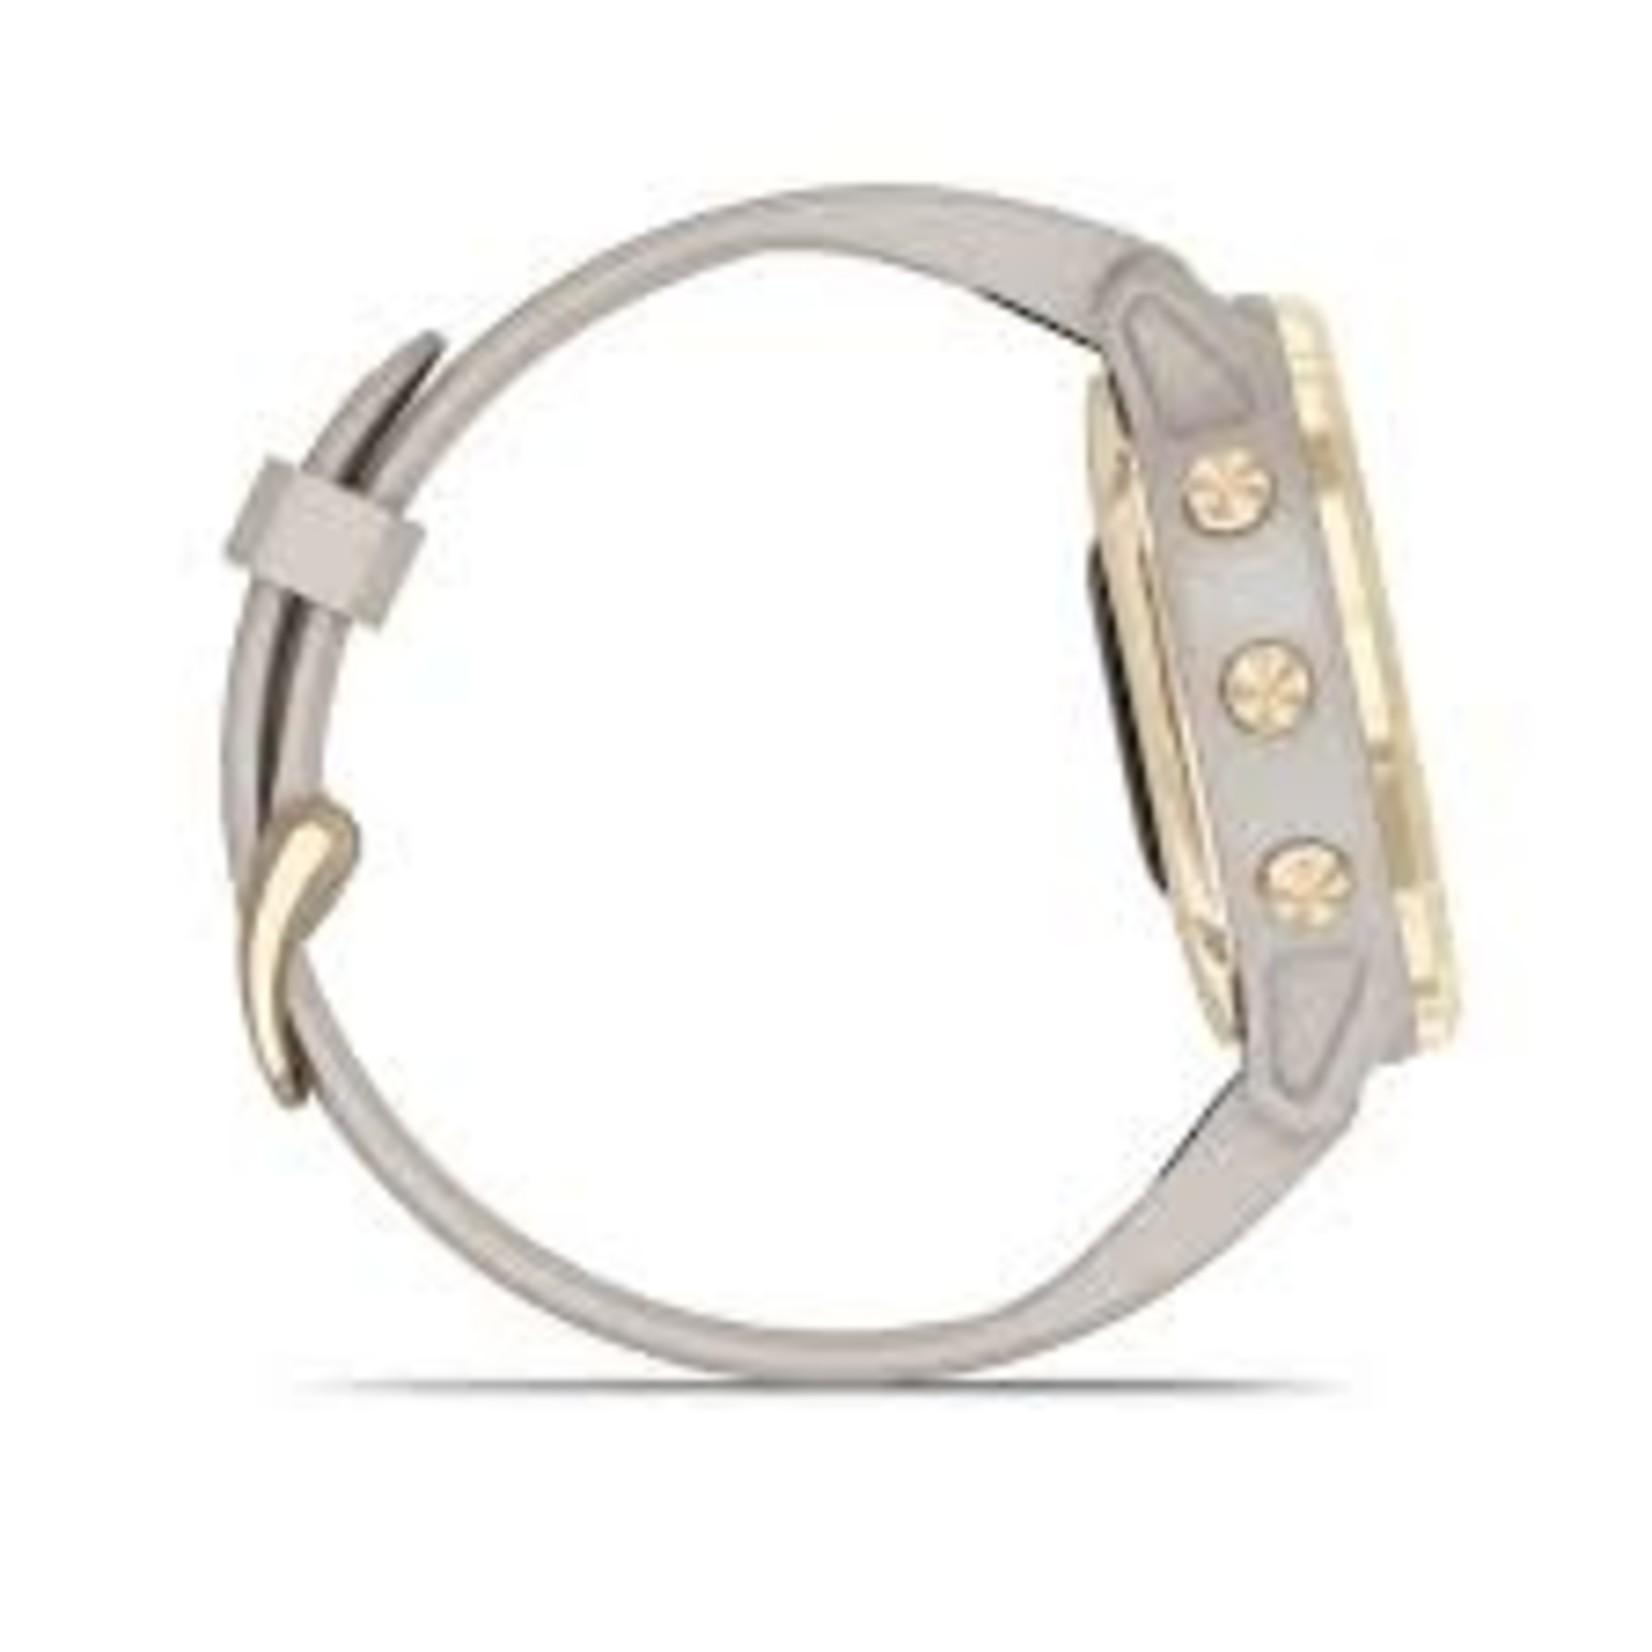 Garmin fēnix® 6S - Pro Solar Edition Light Gold with Light Sand Band